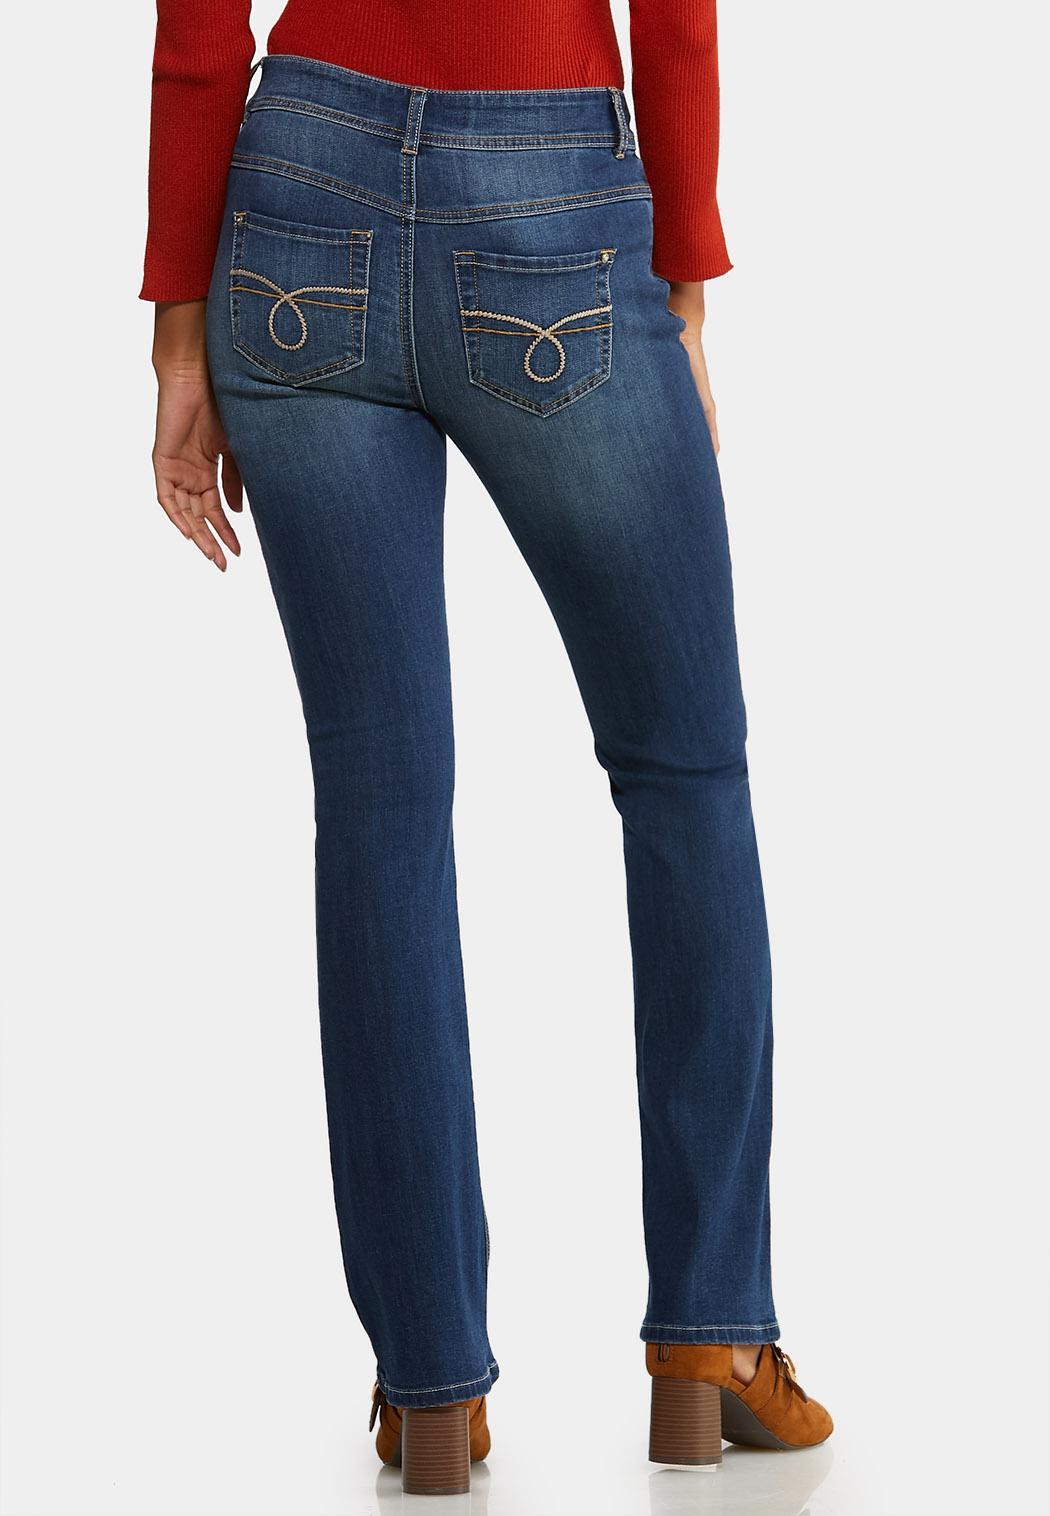 Petite Bootcut Jeans (Item #43991898)